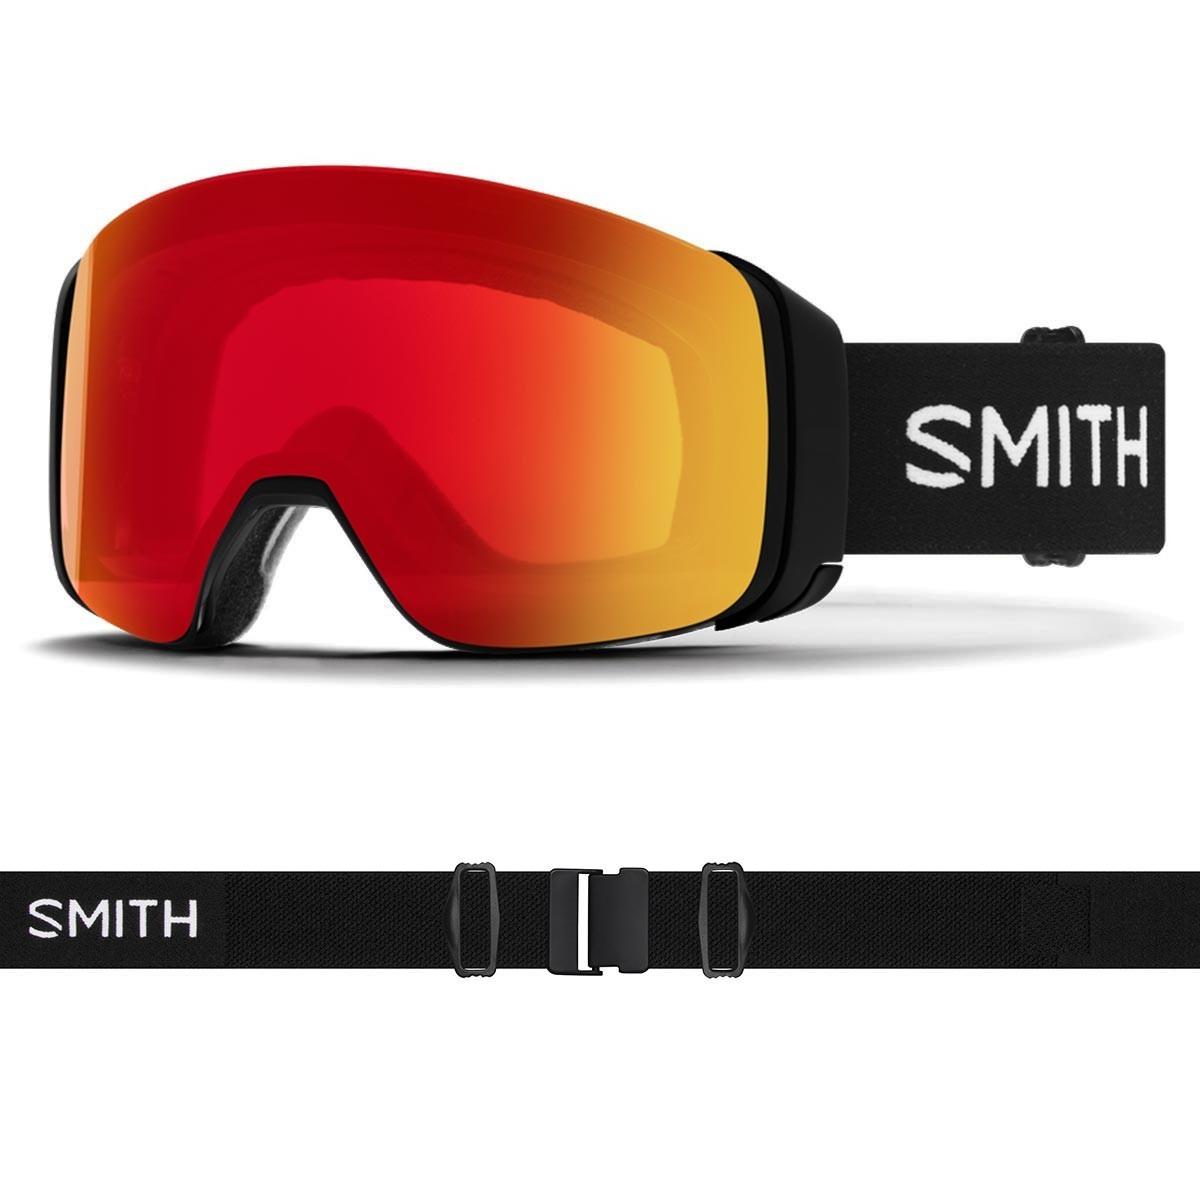 SMITH 4D MAG black | S3-S2 CHROMAPOP Photochromic Red Mirror - Изображение - AQUAMATRIX